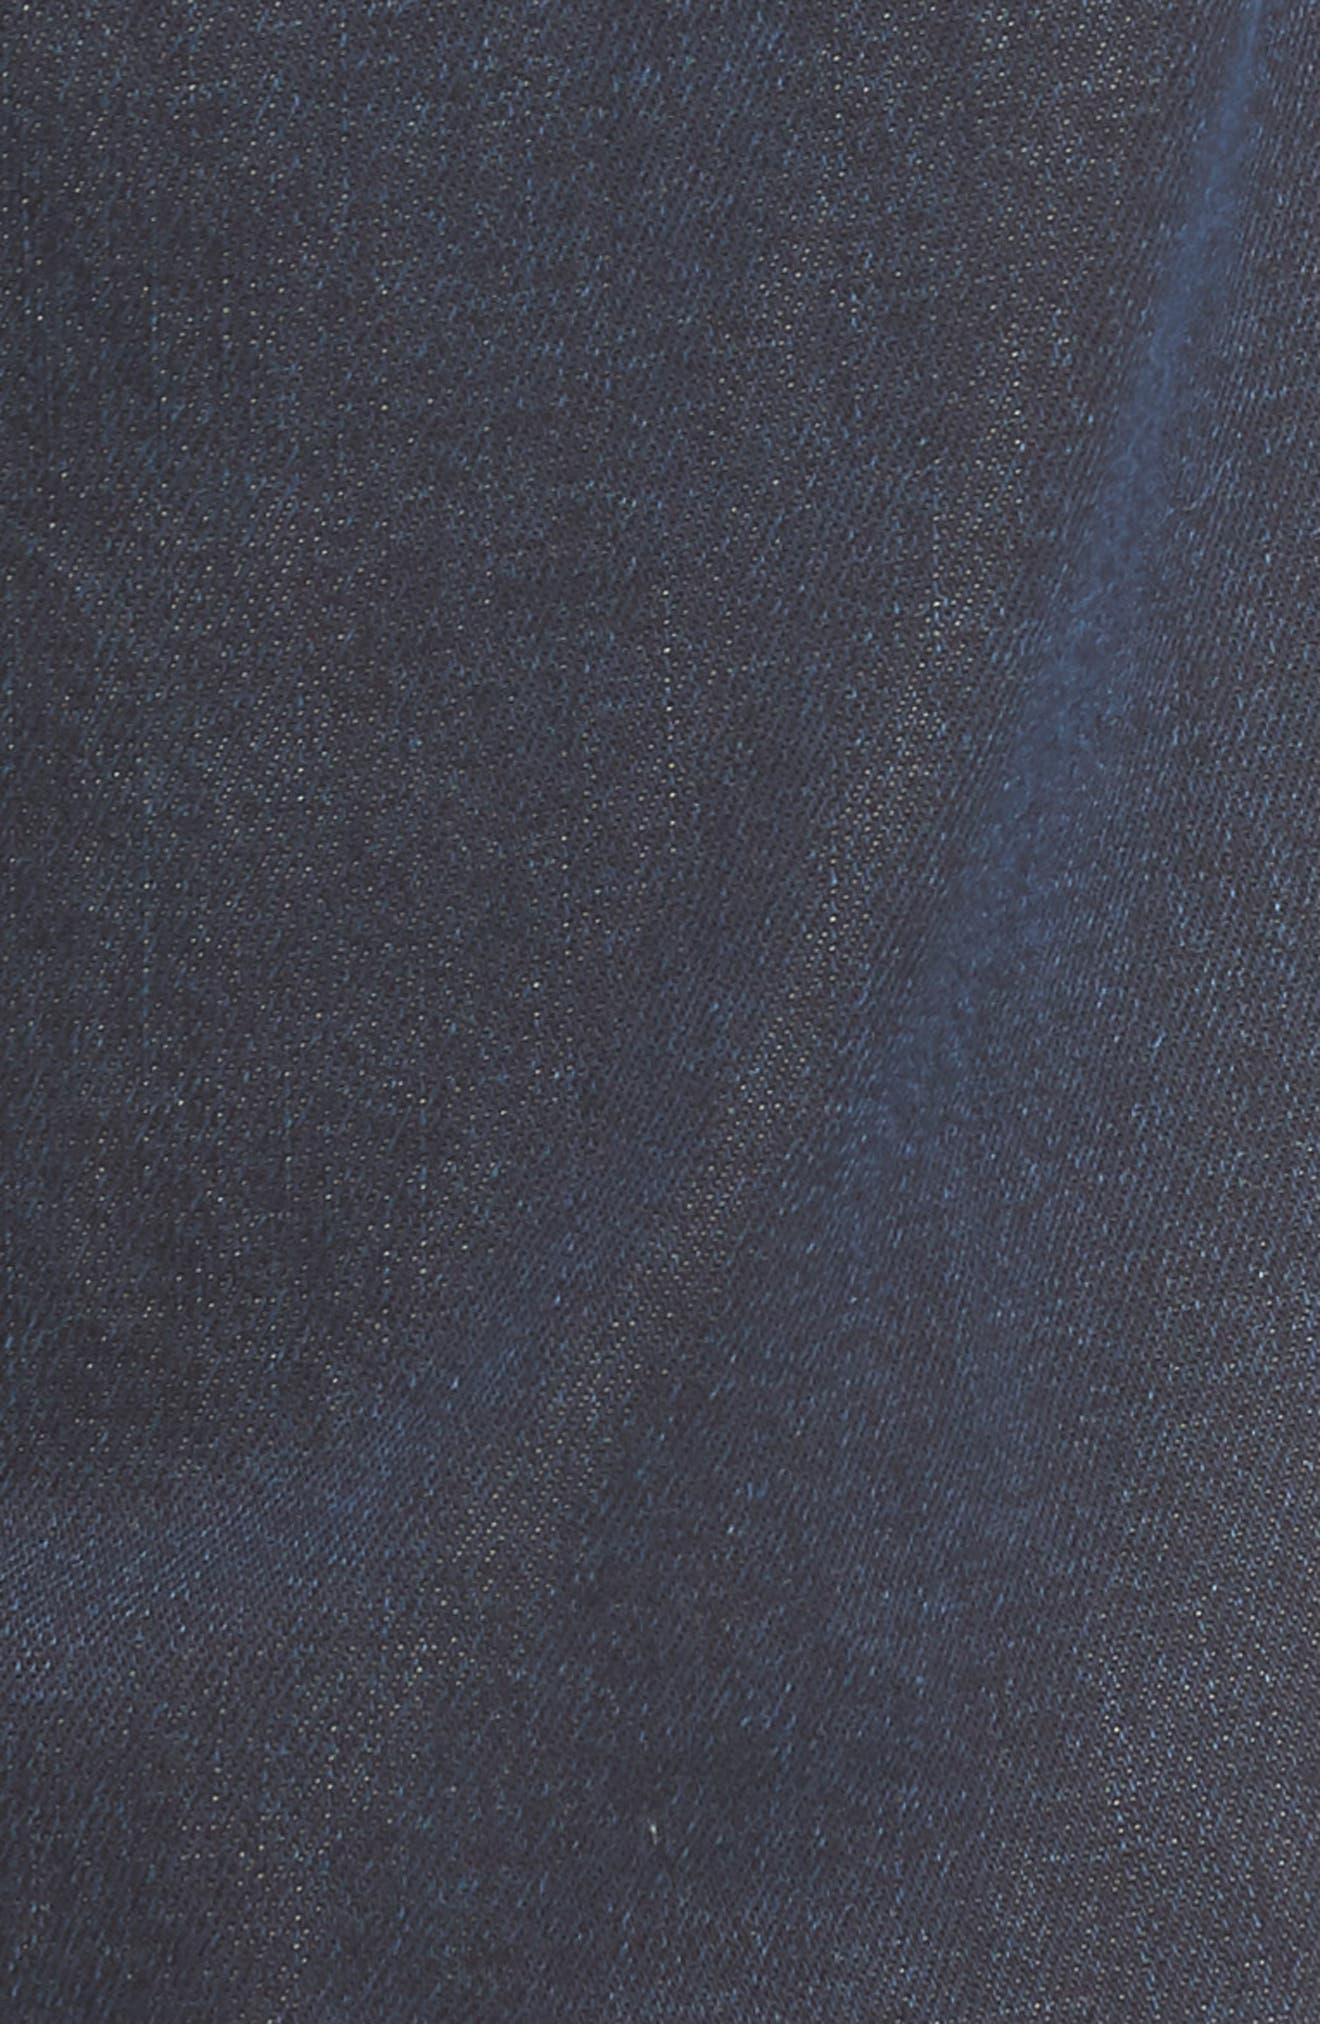 Thommer Slim Fit Jeans,                             Alternate thumbnail 5, color,                             Denim